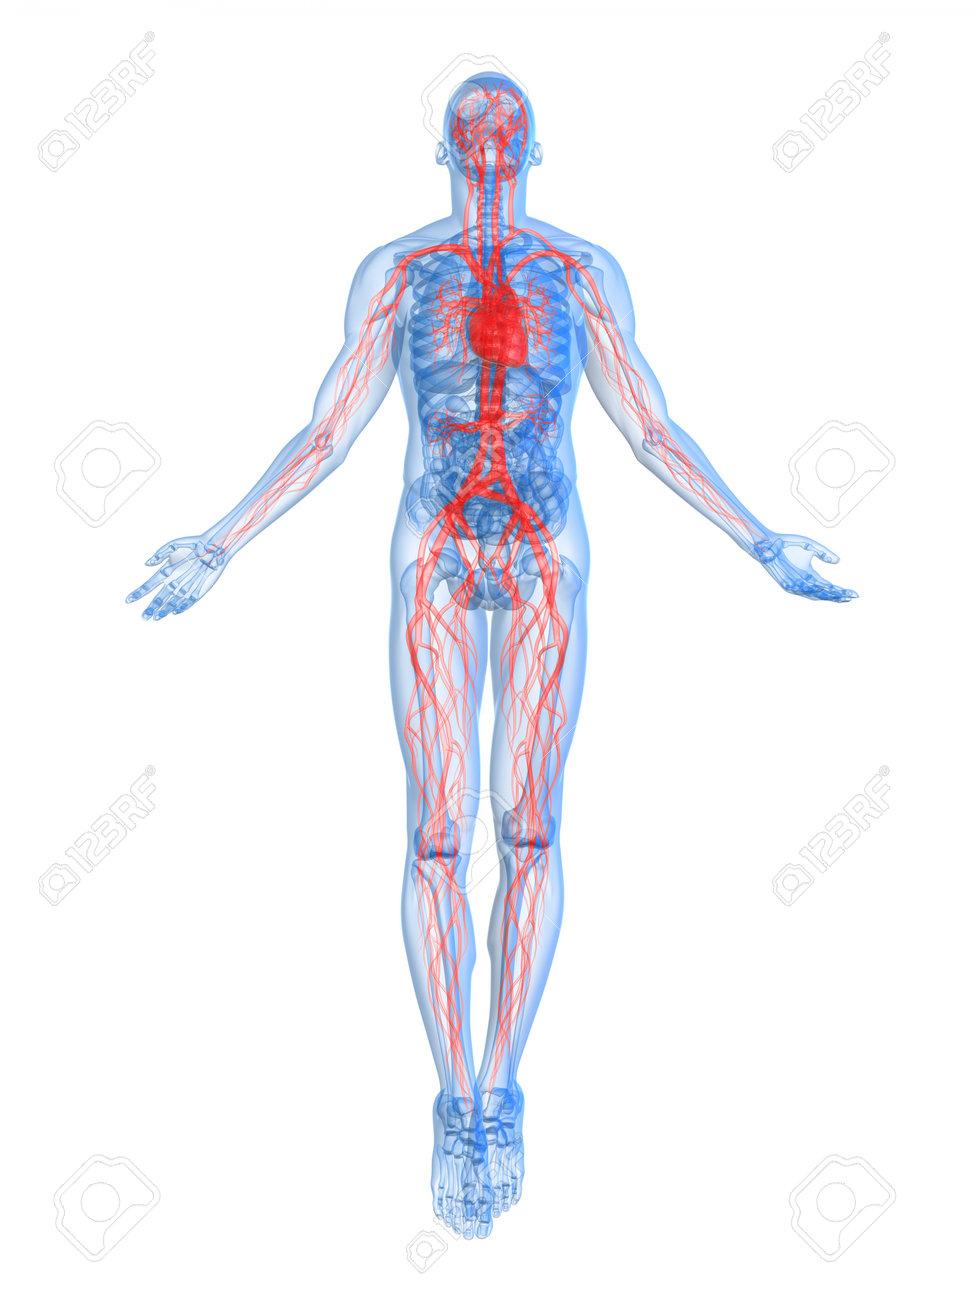 vascular system stock photos. royalty free vascular system images, Sphenoid